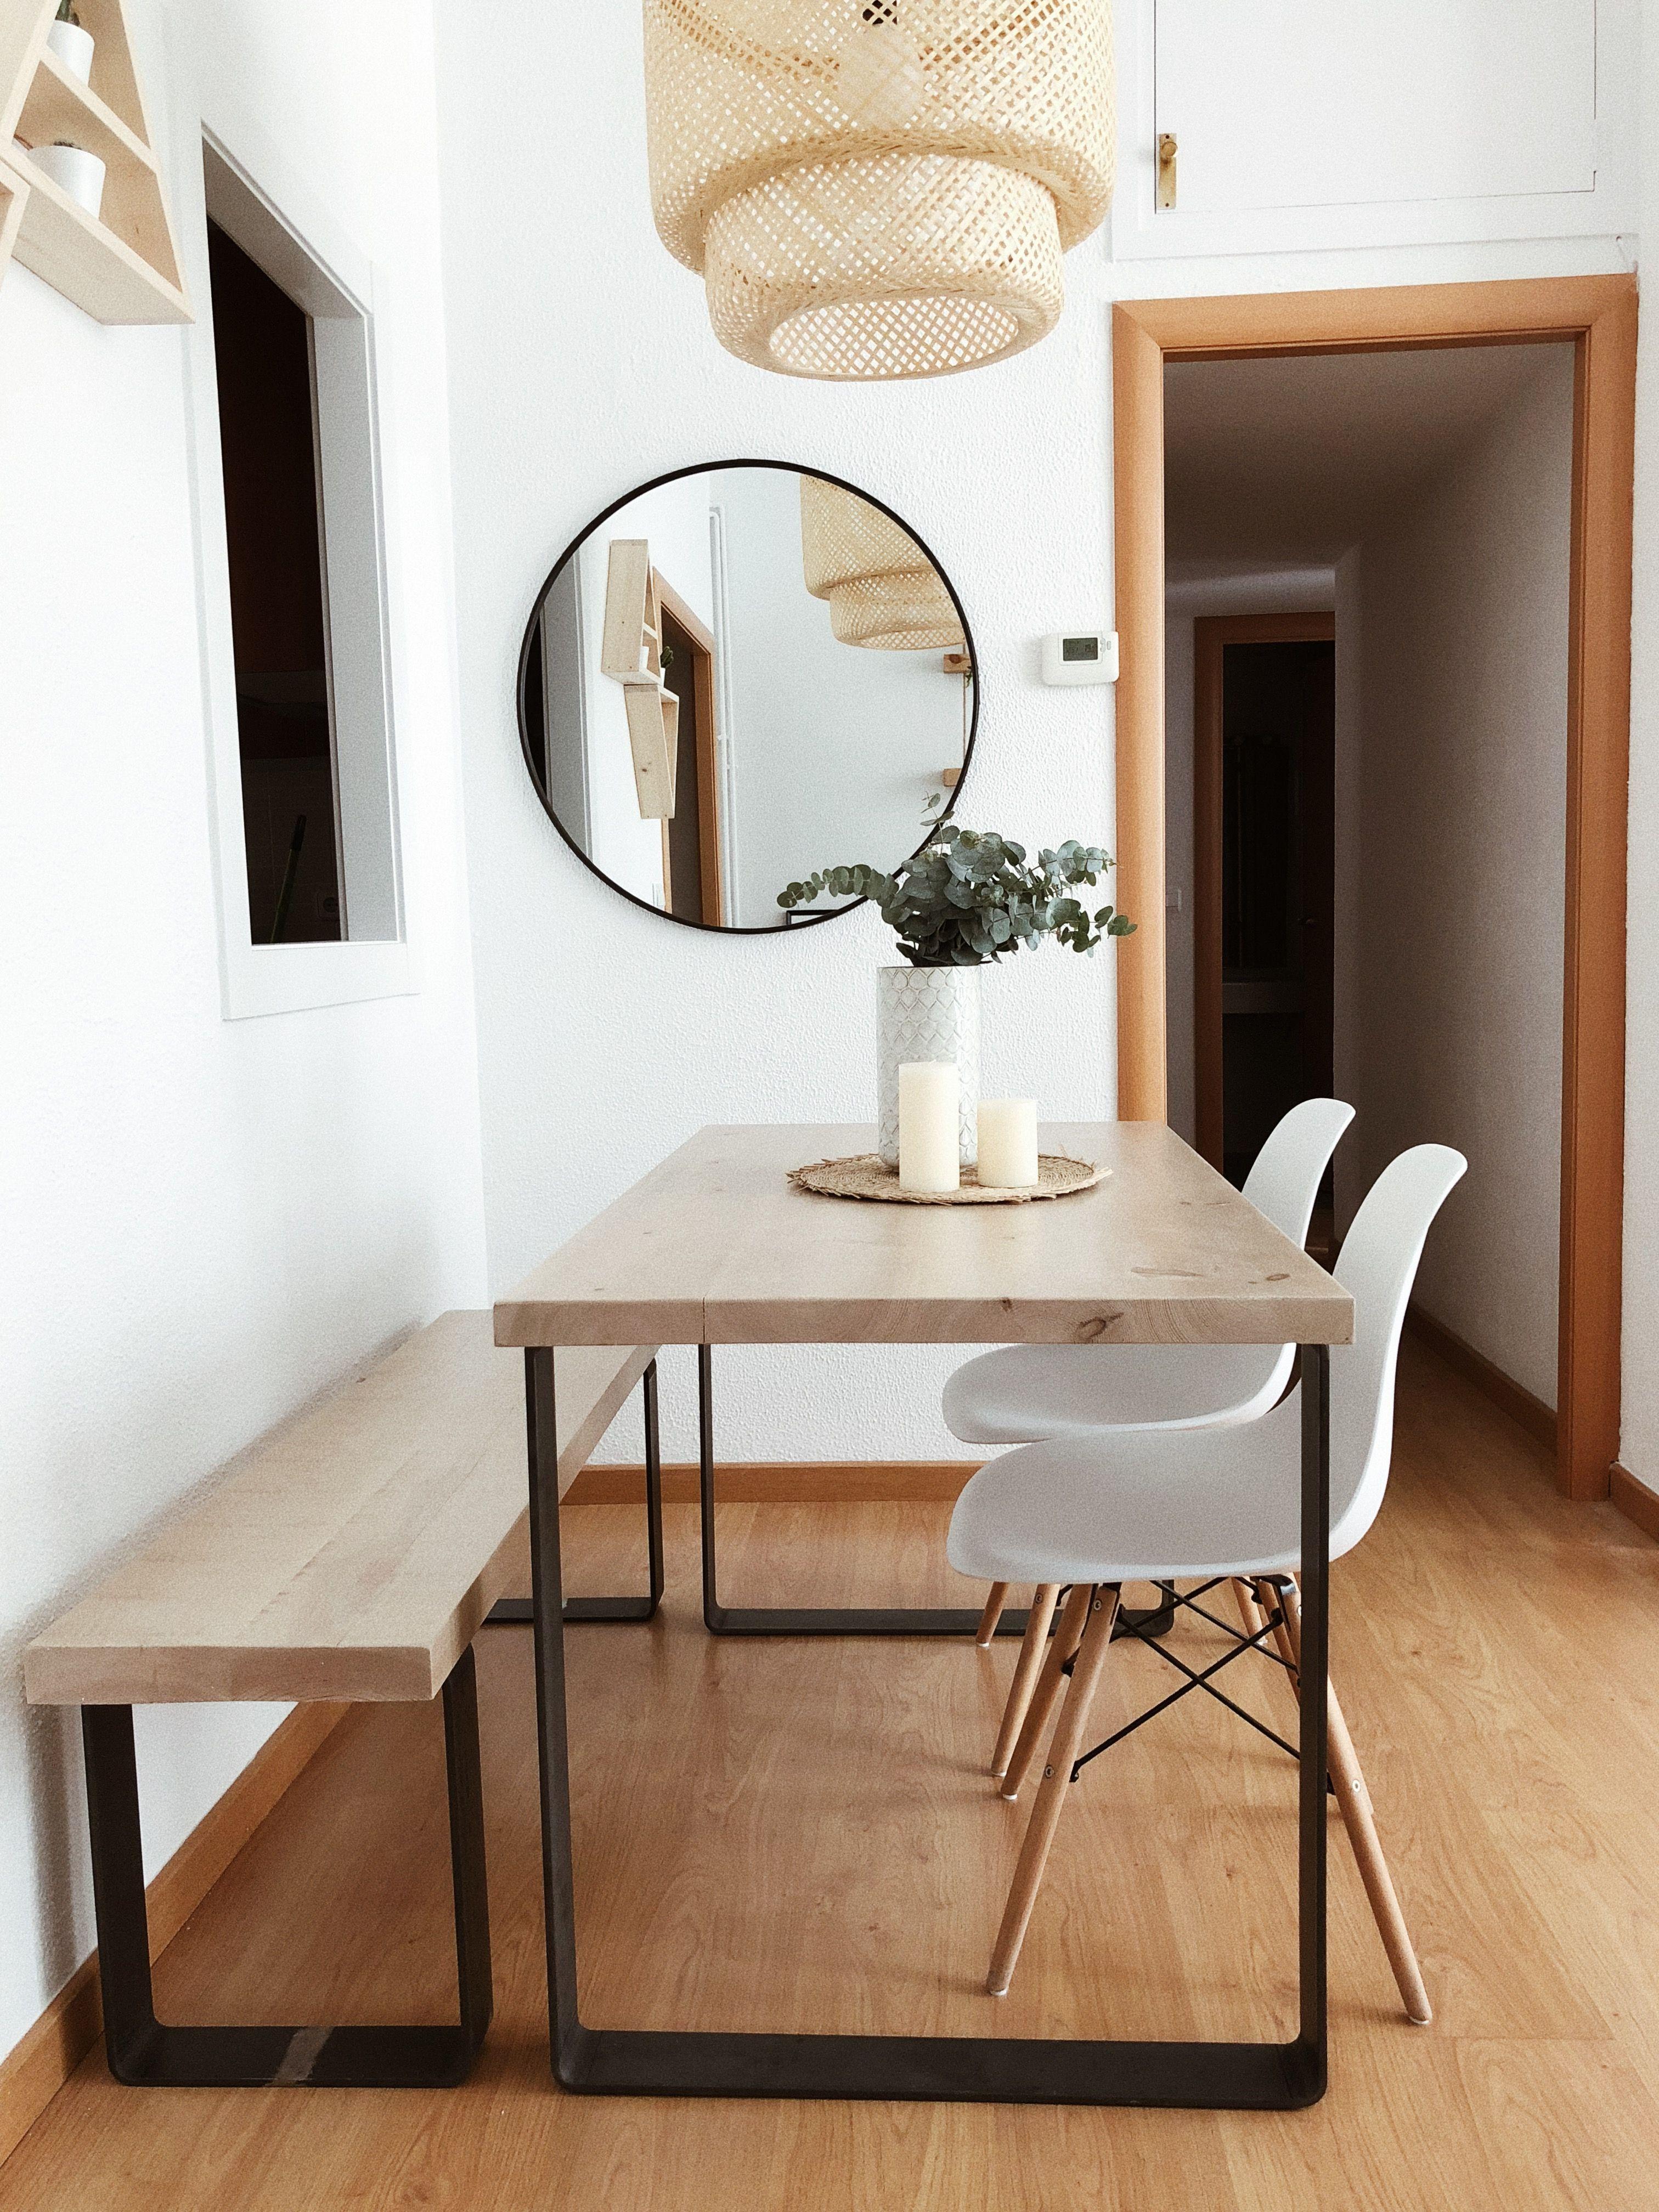 Mesa comedor dabir pino tablones ceniza salon for Banco para mesa de comedor